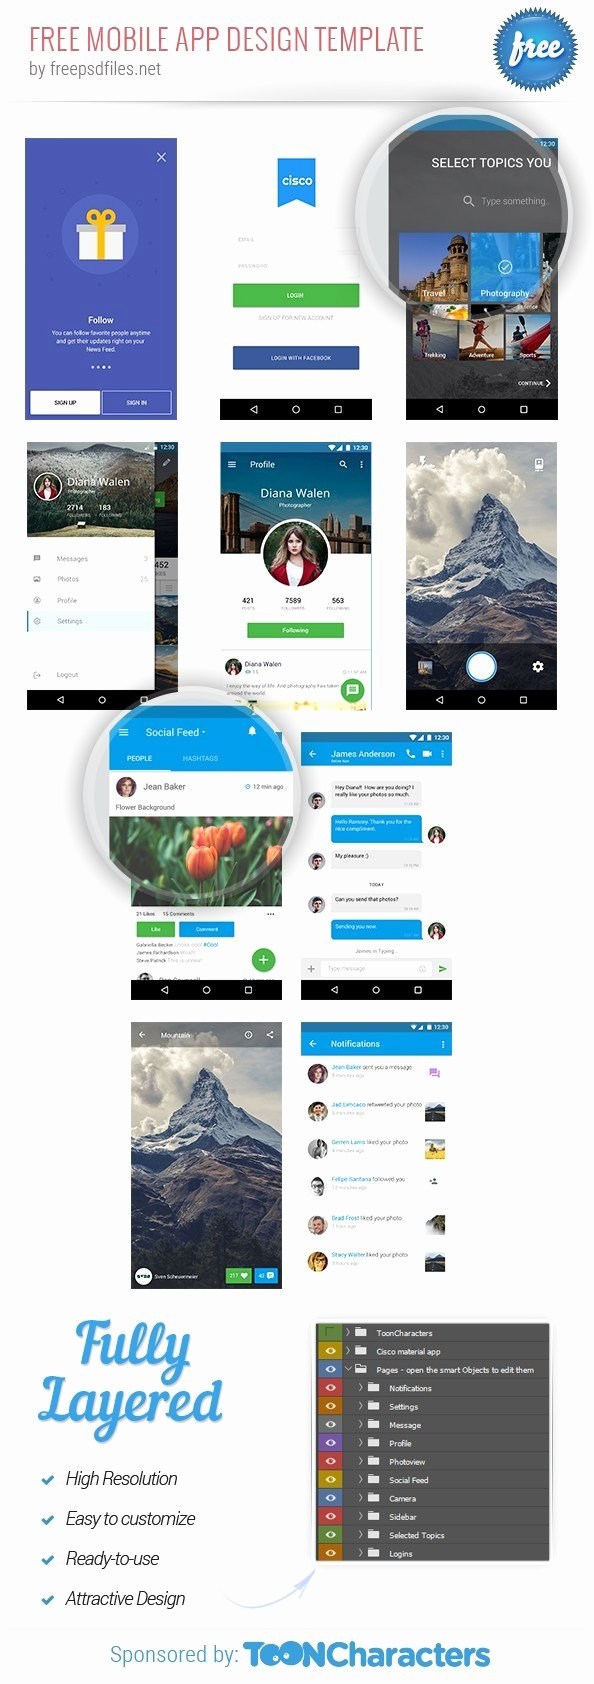 Mobile Apps Design Template Elegant Free Mobile Application Design Template Free Psd Files